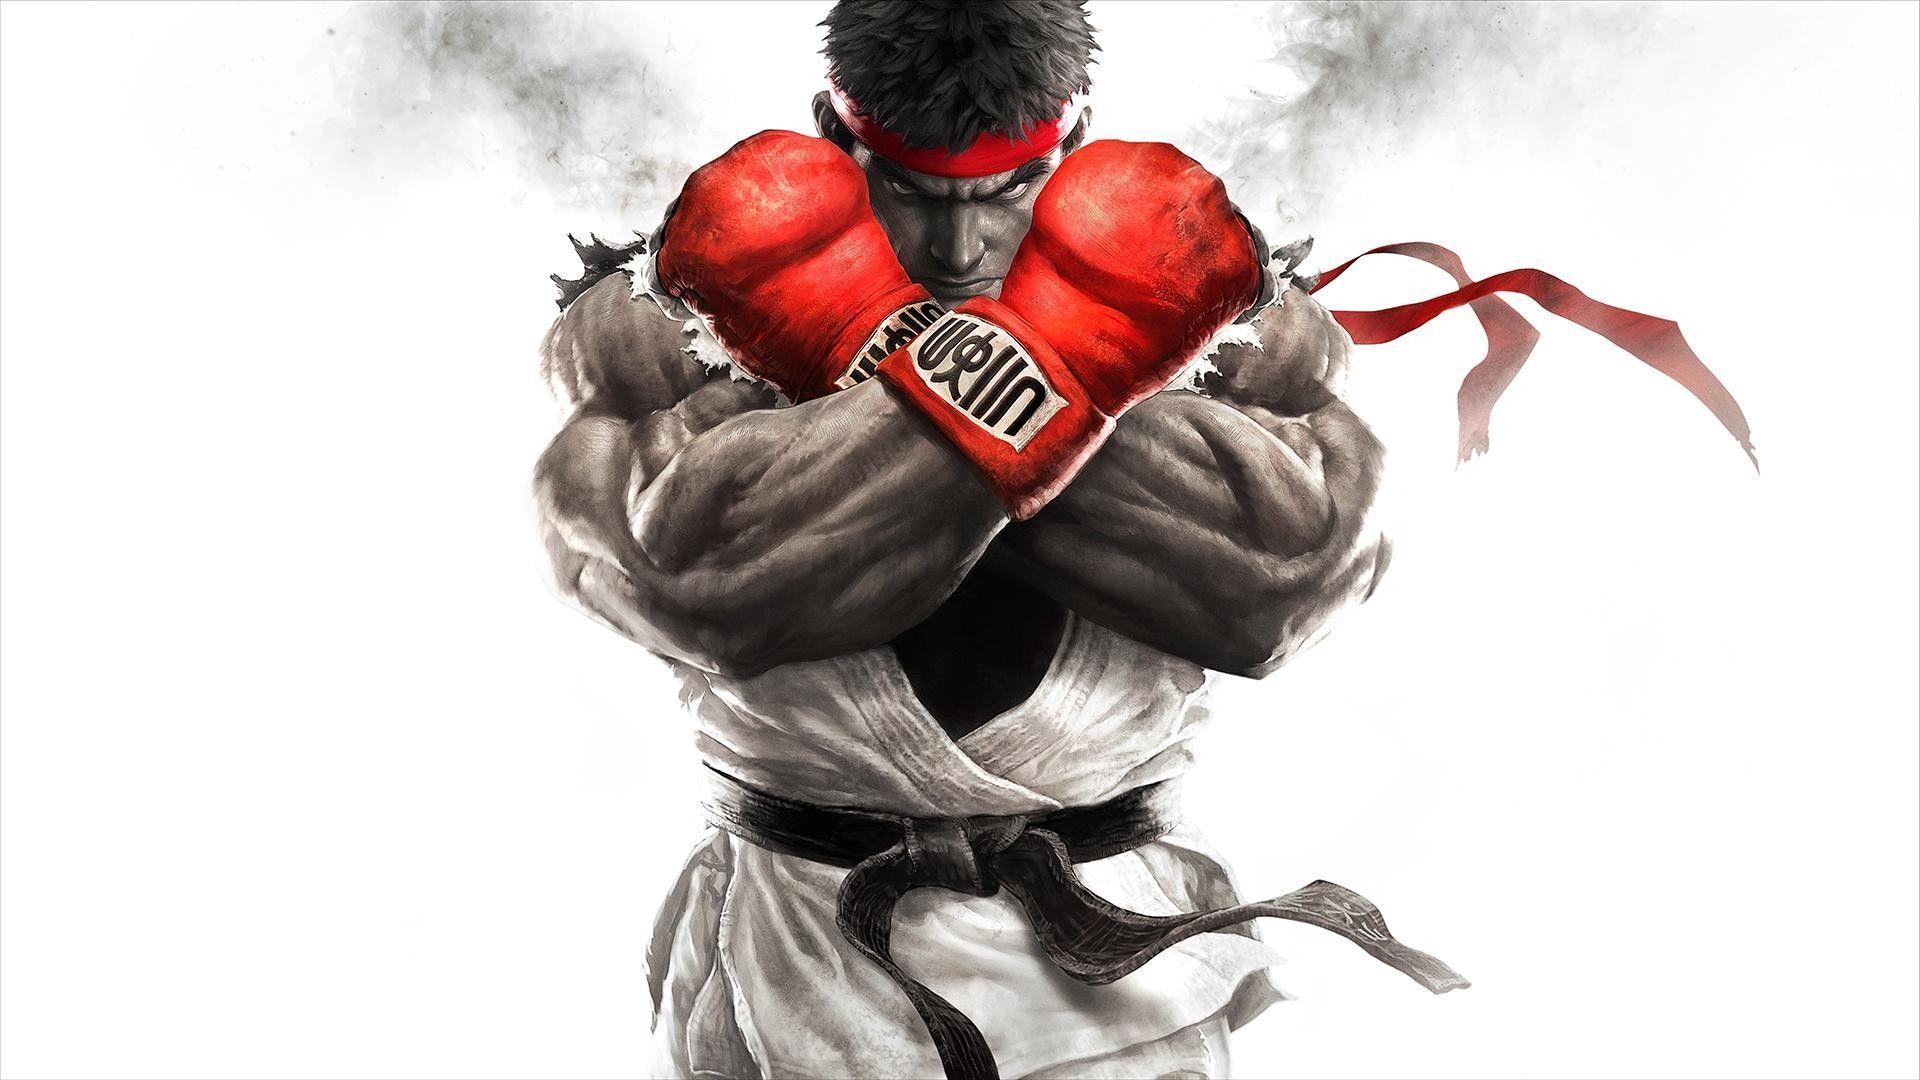 ryu street fighter wallpaper iphone